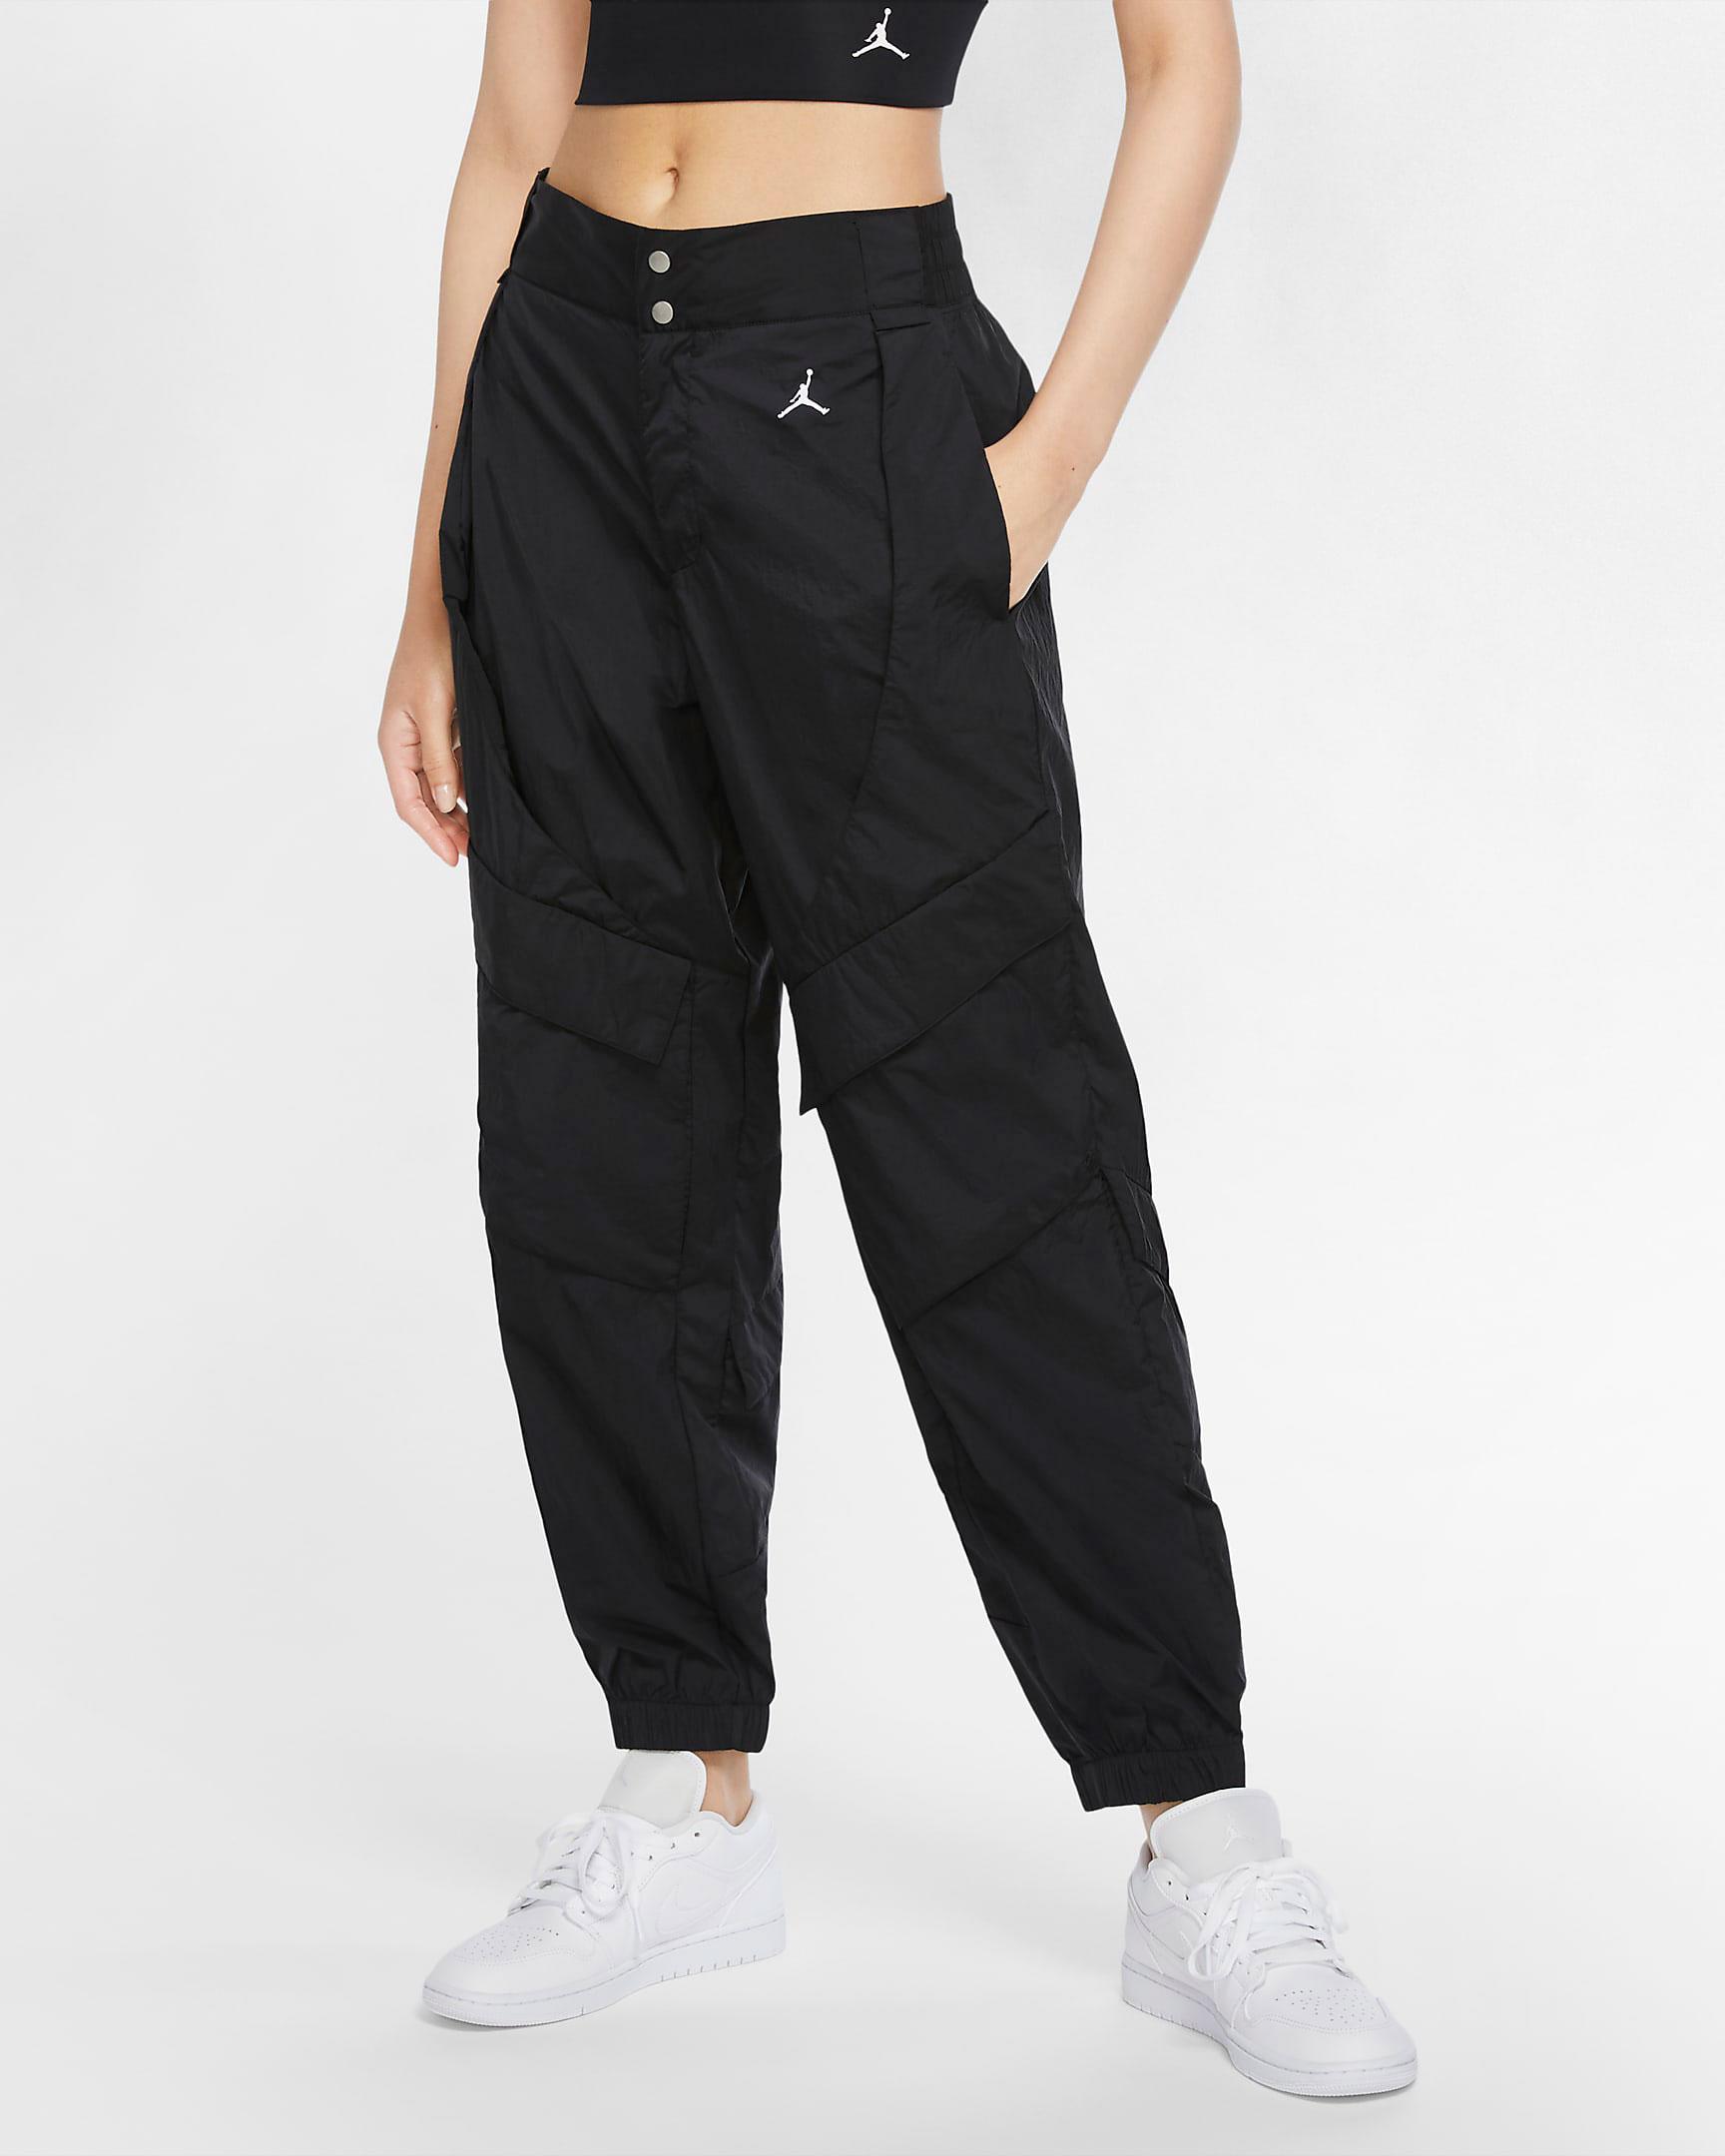 jordan-womens-utility-pant-black-1